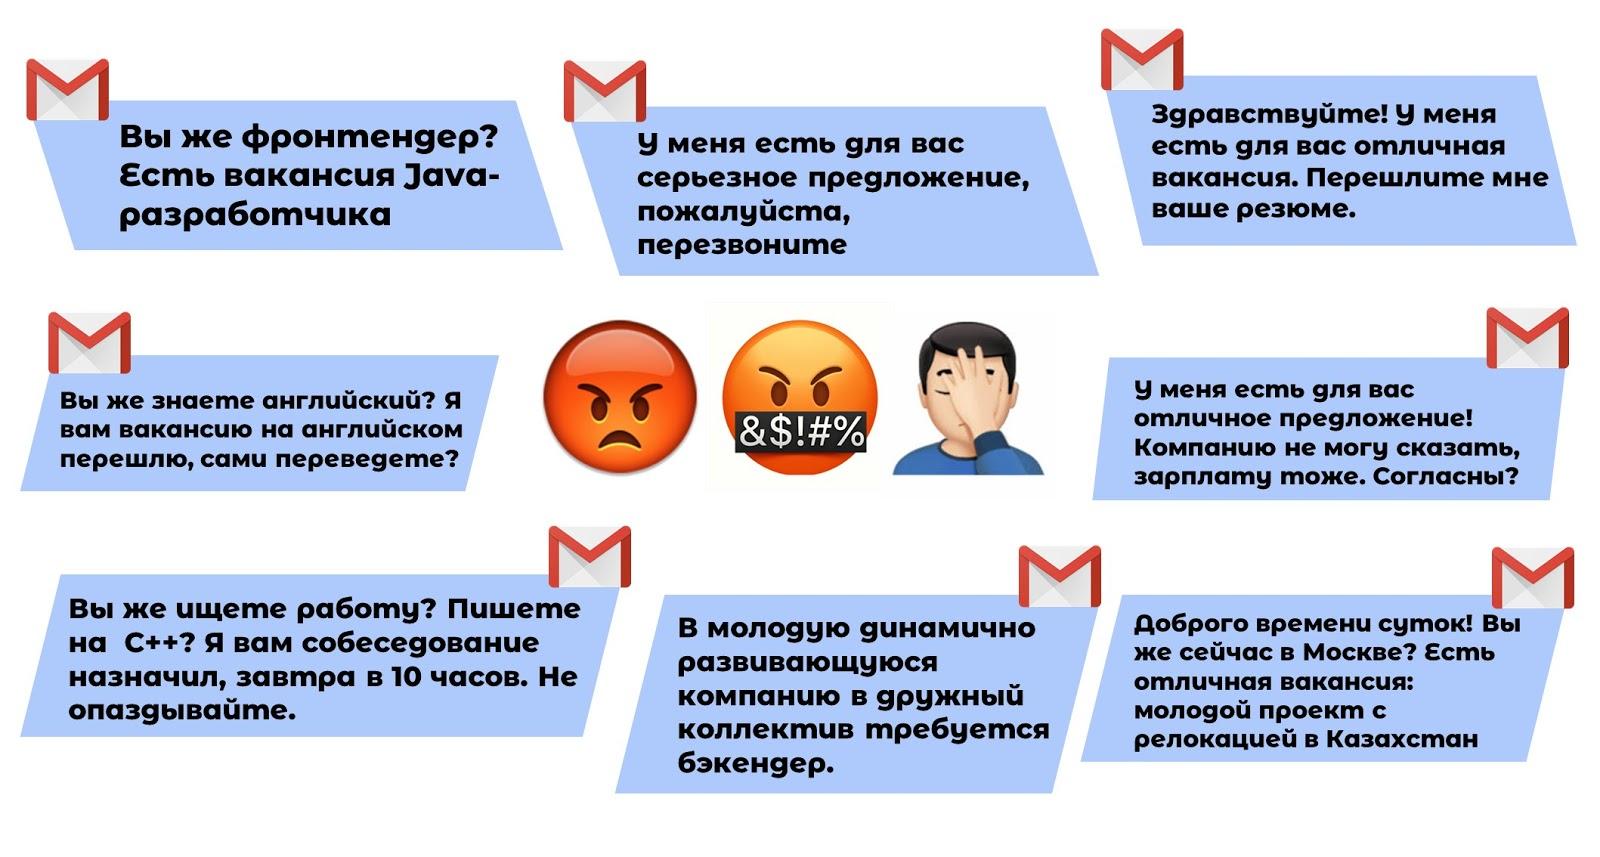 Лайфхаки разработчикам от рекрутера - 1